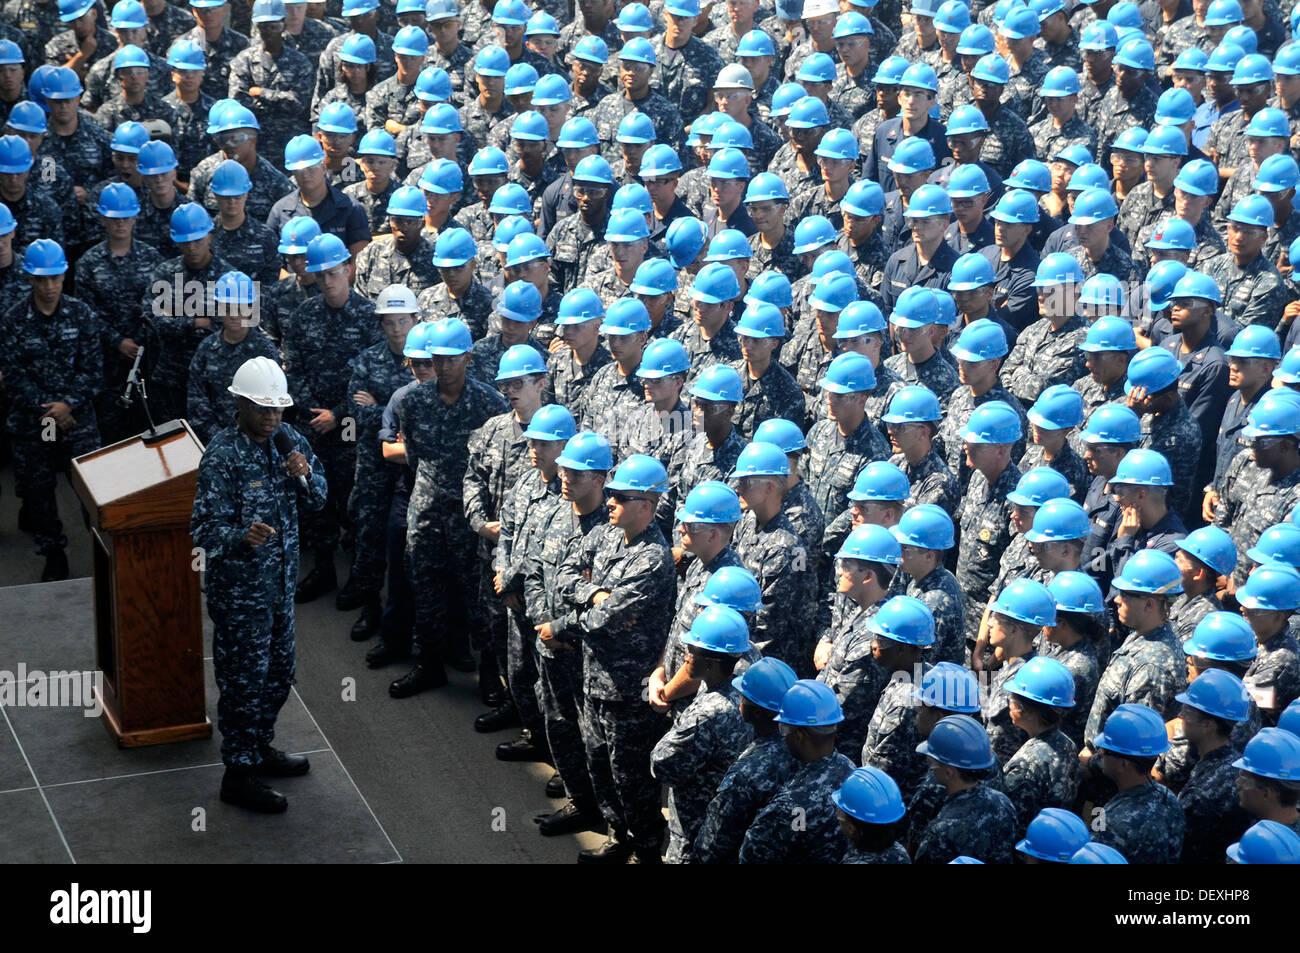 Commander, Expeditionary Strike Group 3 Rear Adm. Frank L. Ponds addresses the crew of amphibious assault ship USS Stock Photo